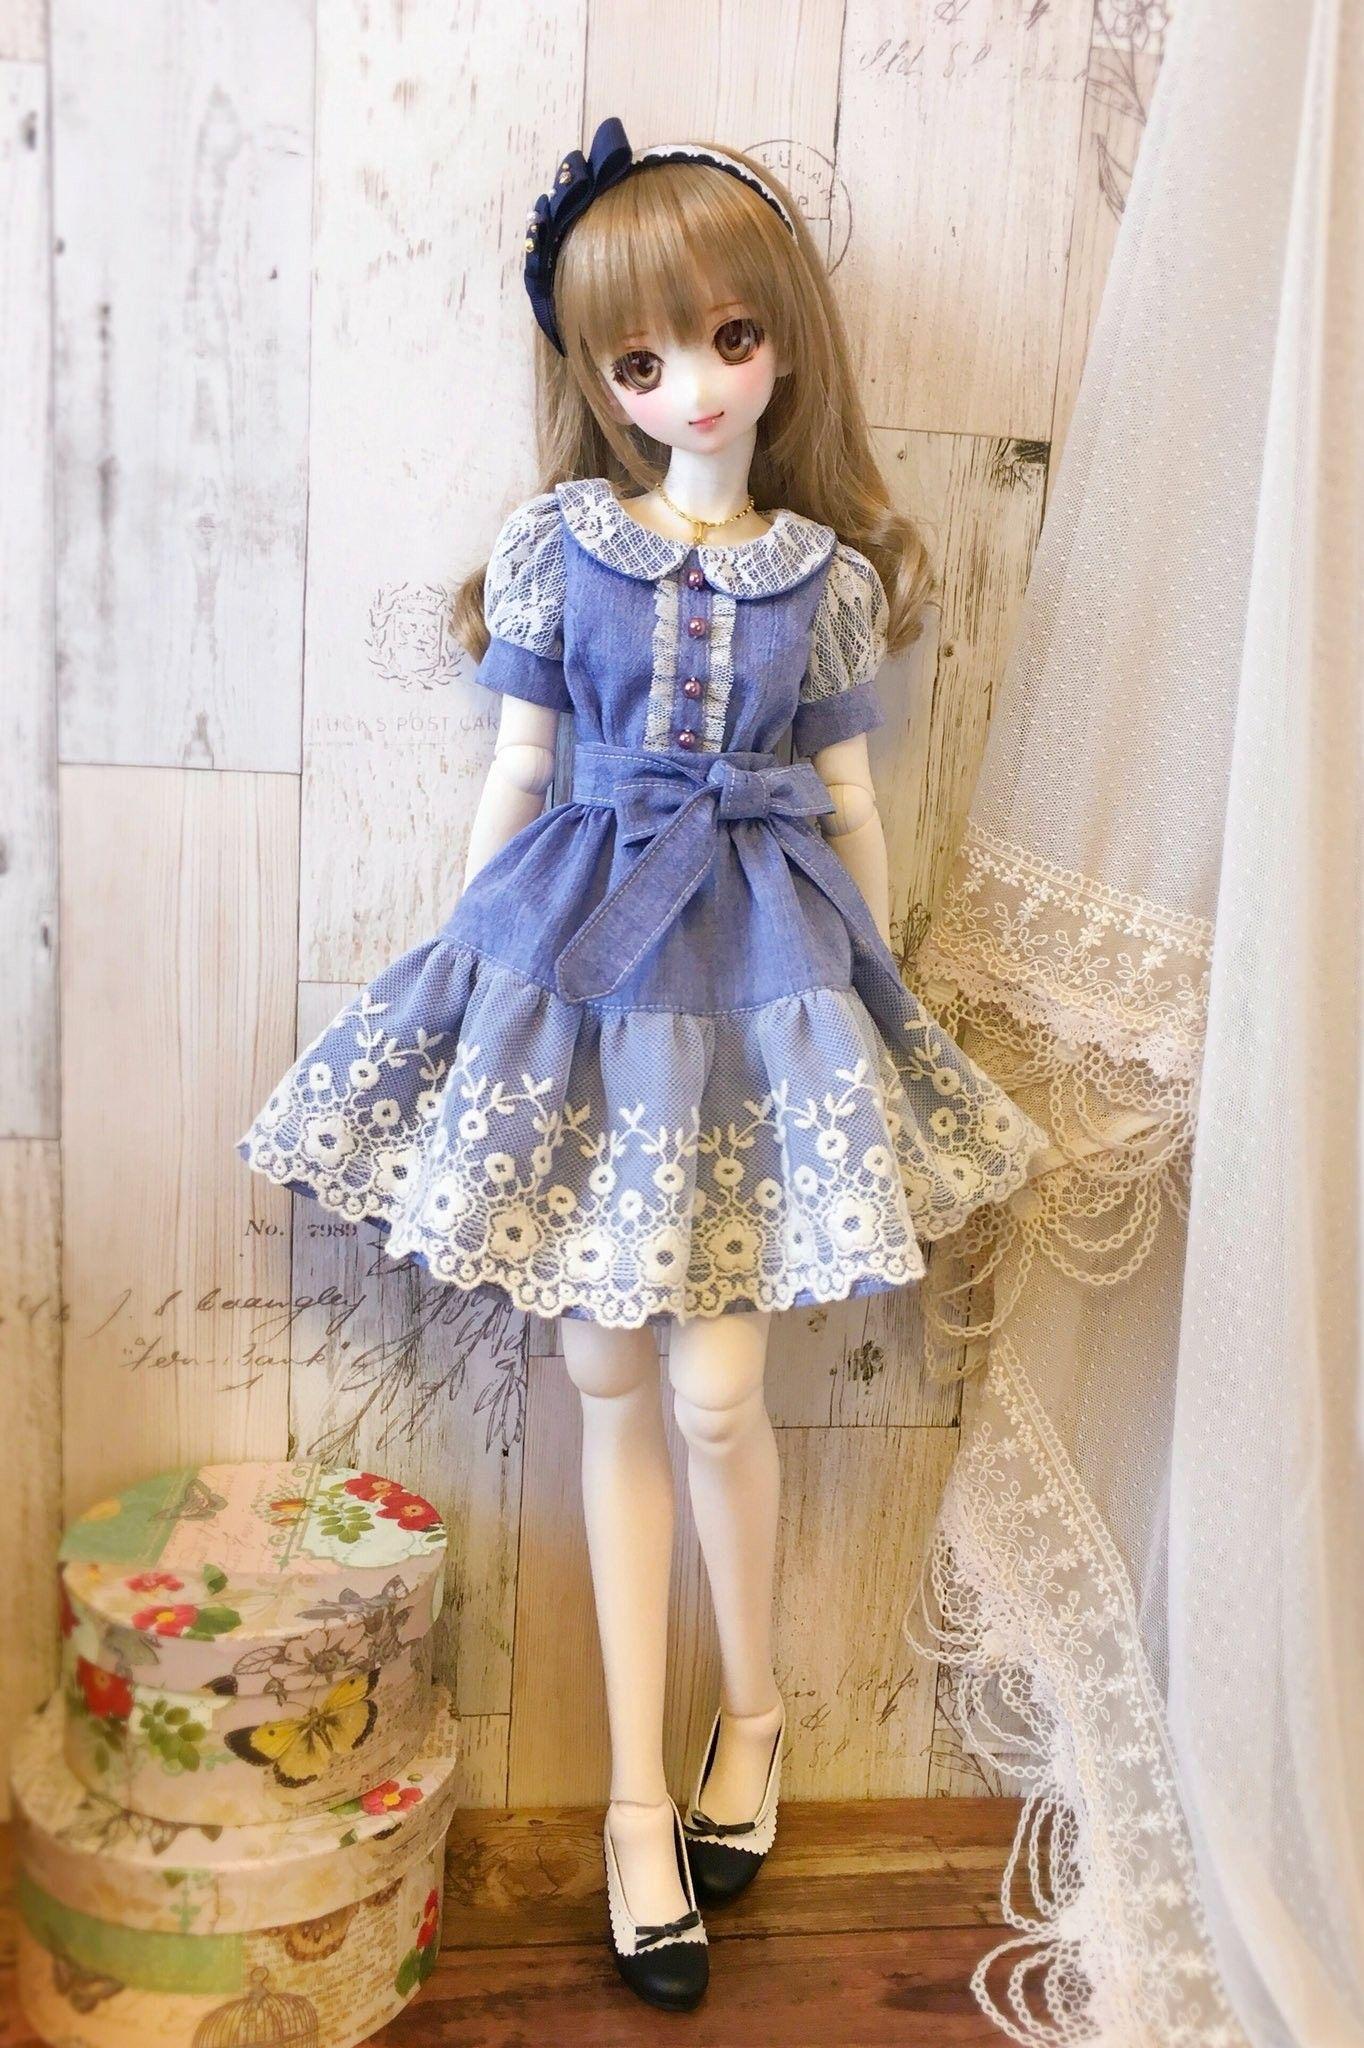 Pin By Merve Basgol On Dresses Patterns Anime Dolls Cute Dolls Licca Chan Doll